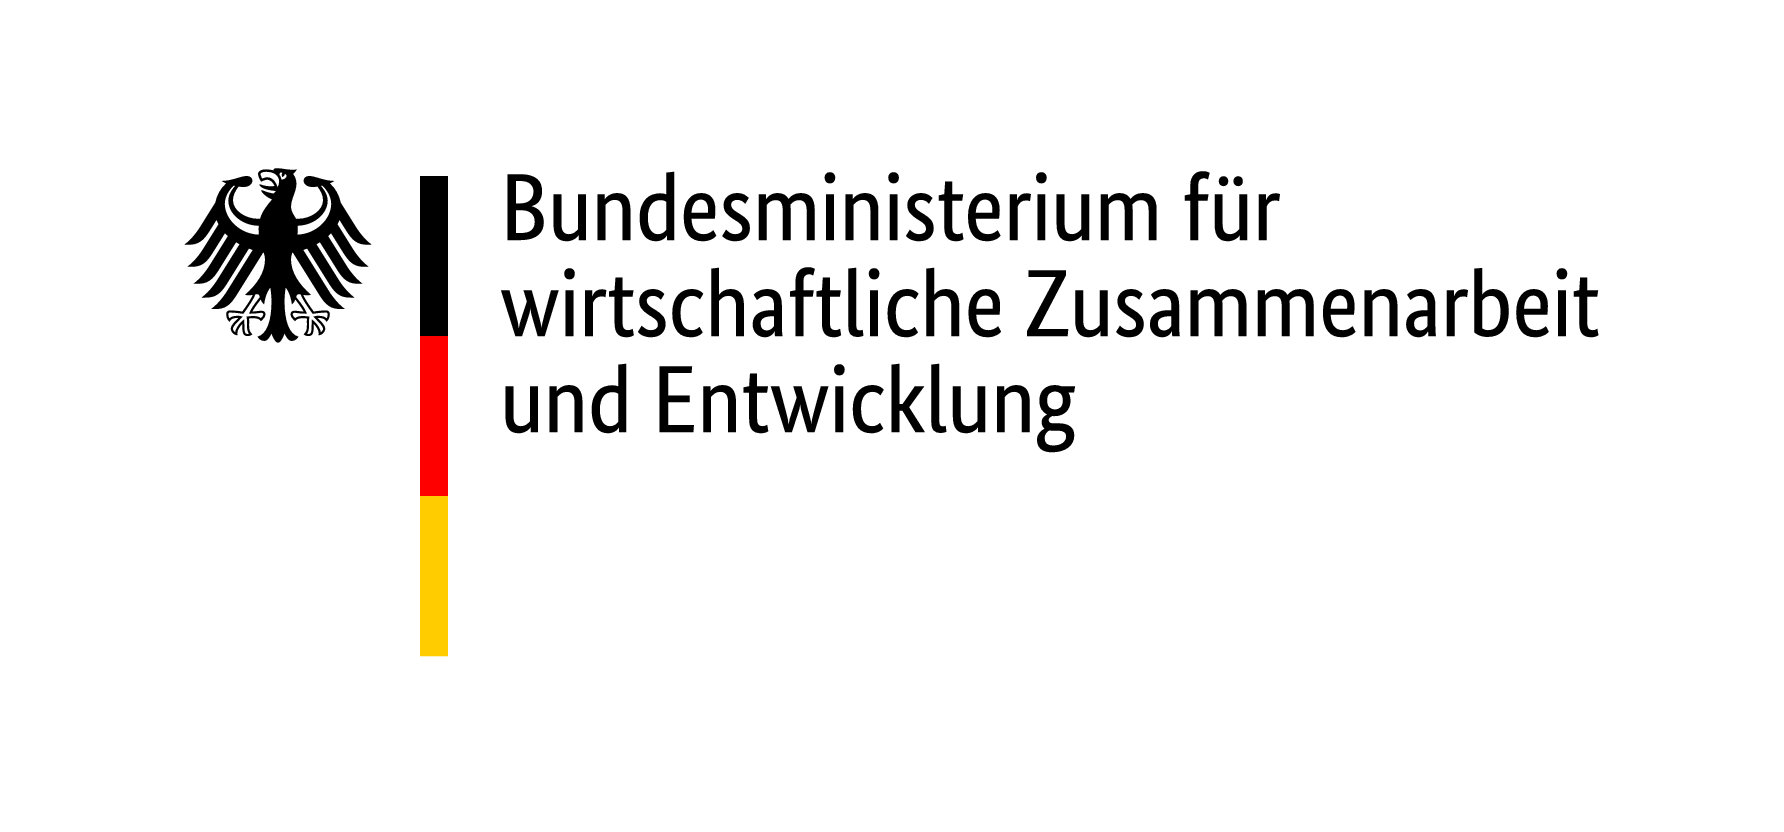 http://www.bmz.de/de/index.html